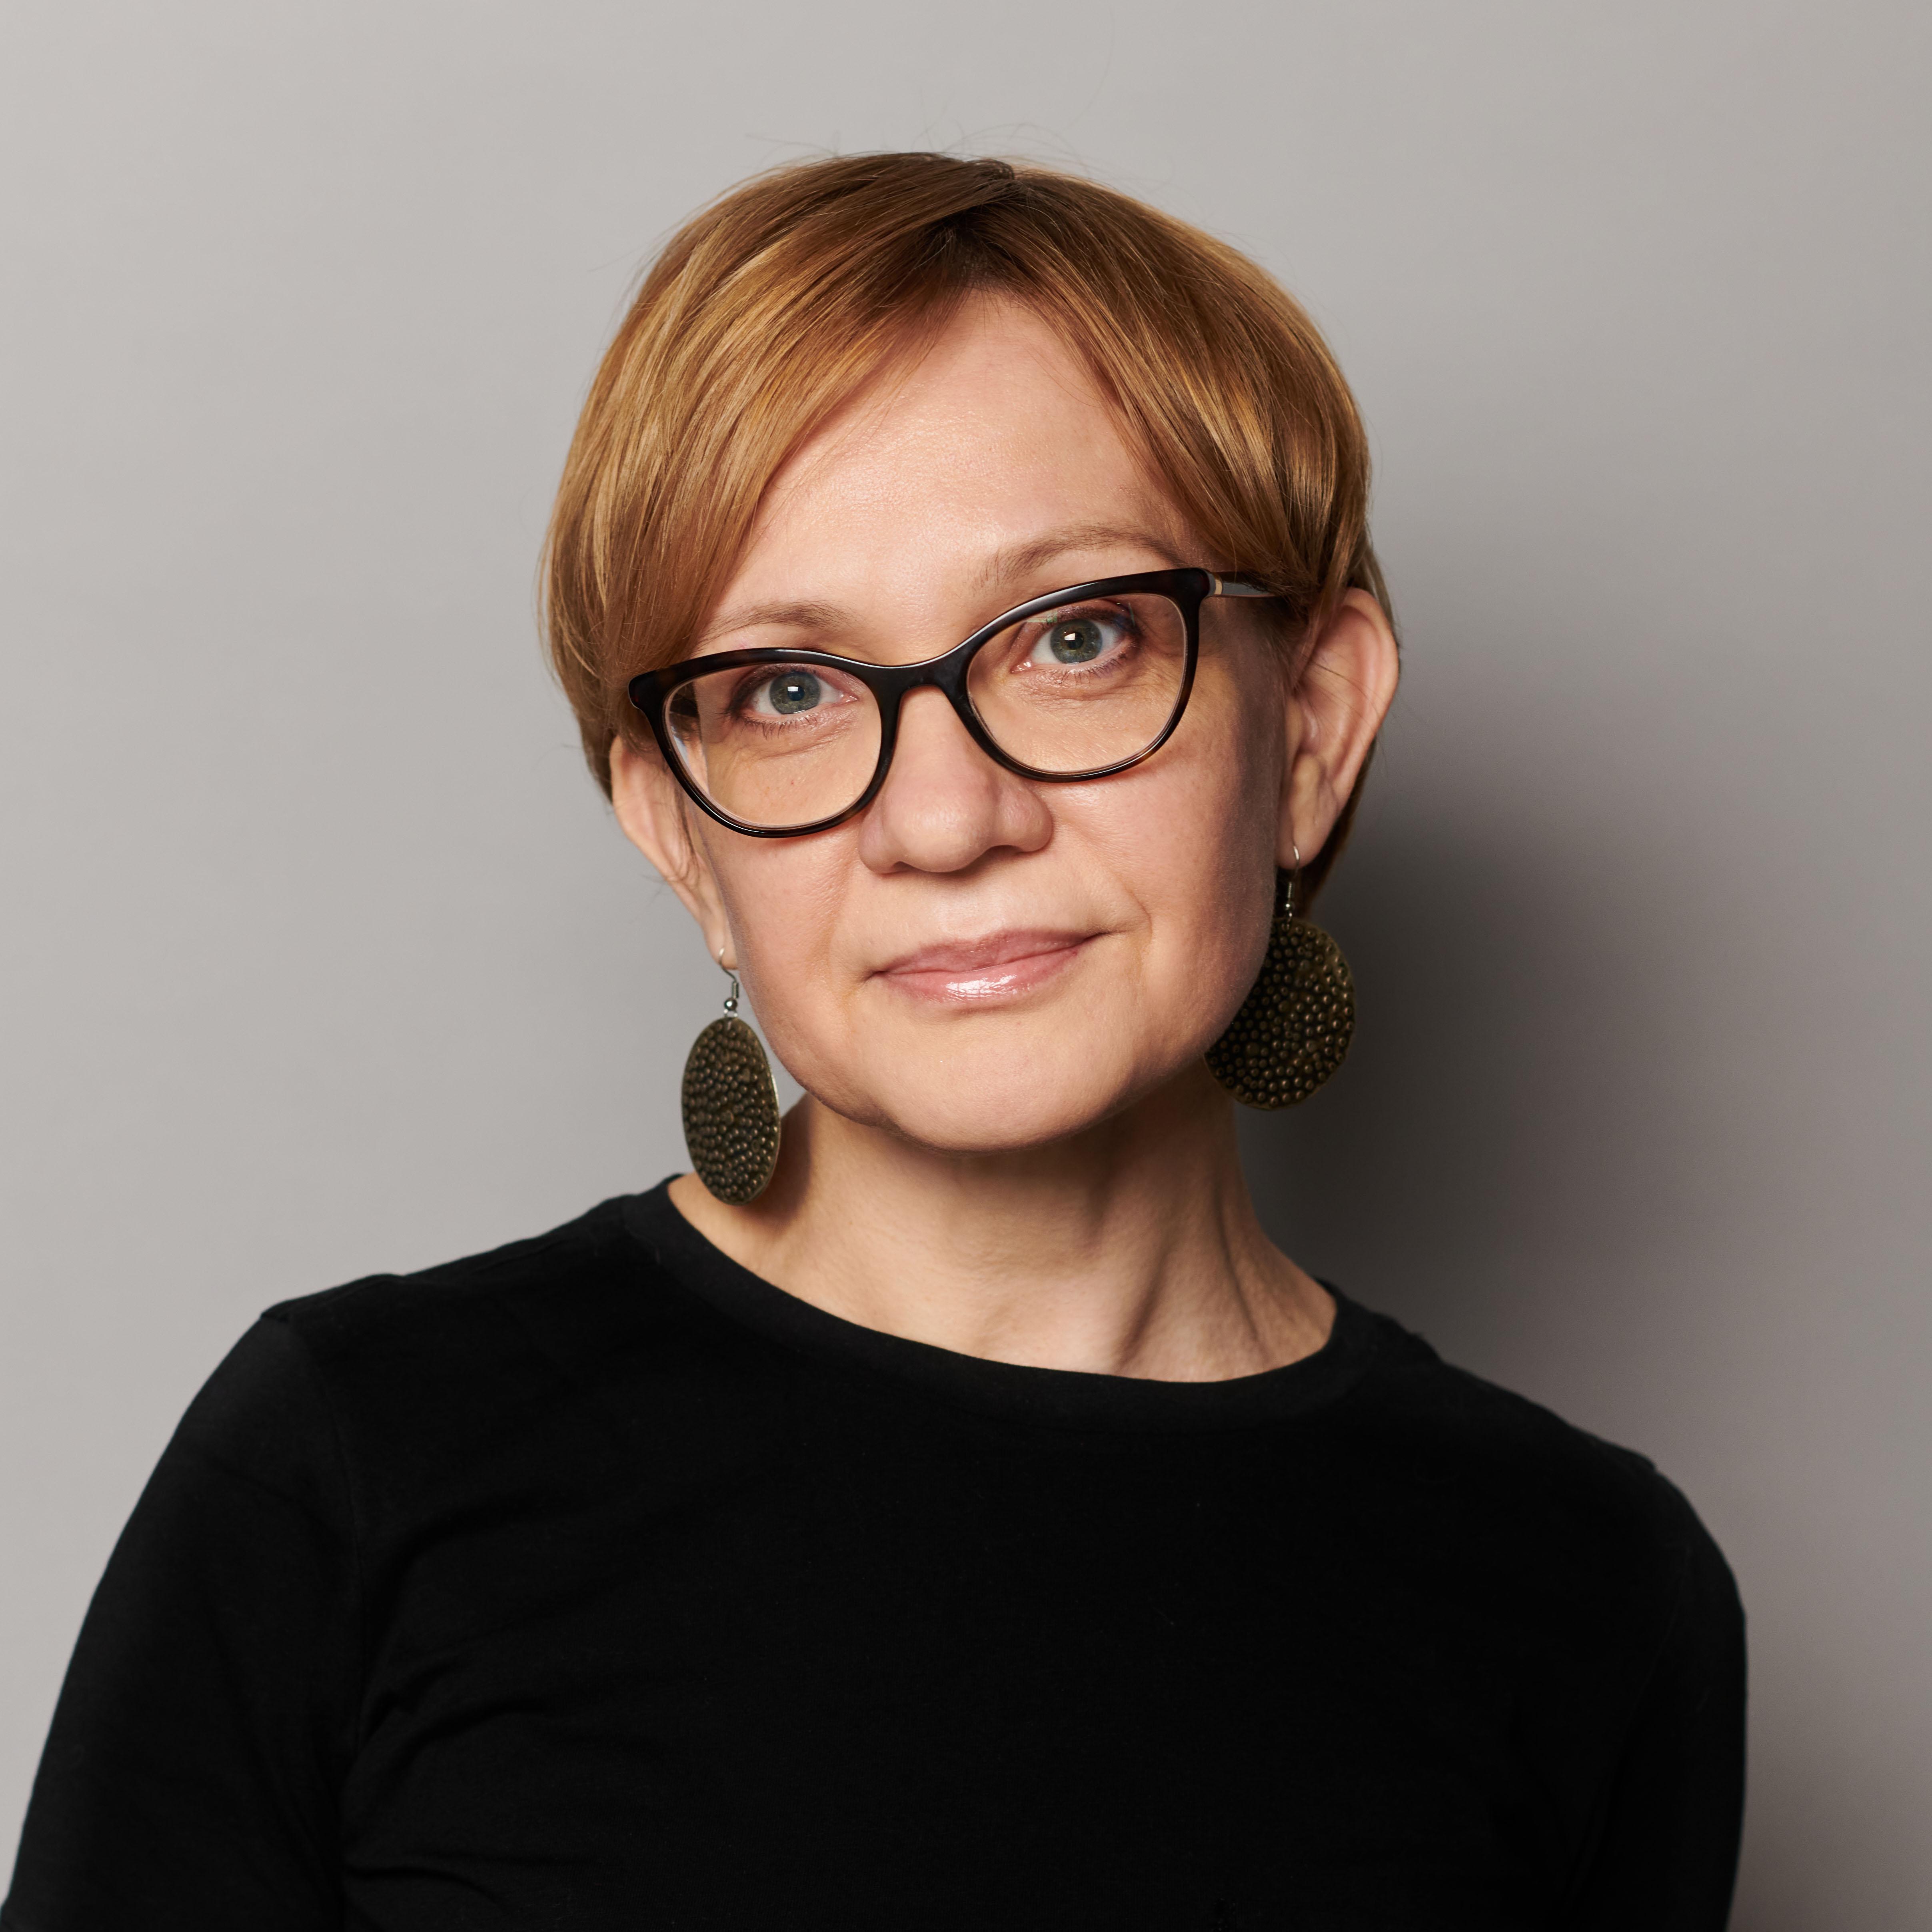 Katarzyna Utracka